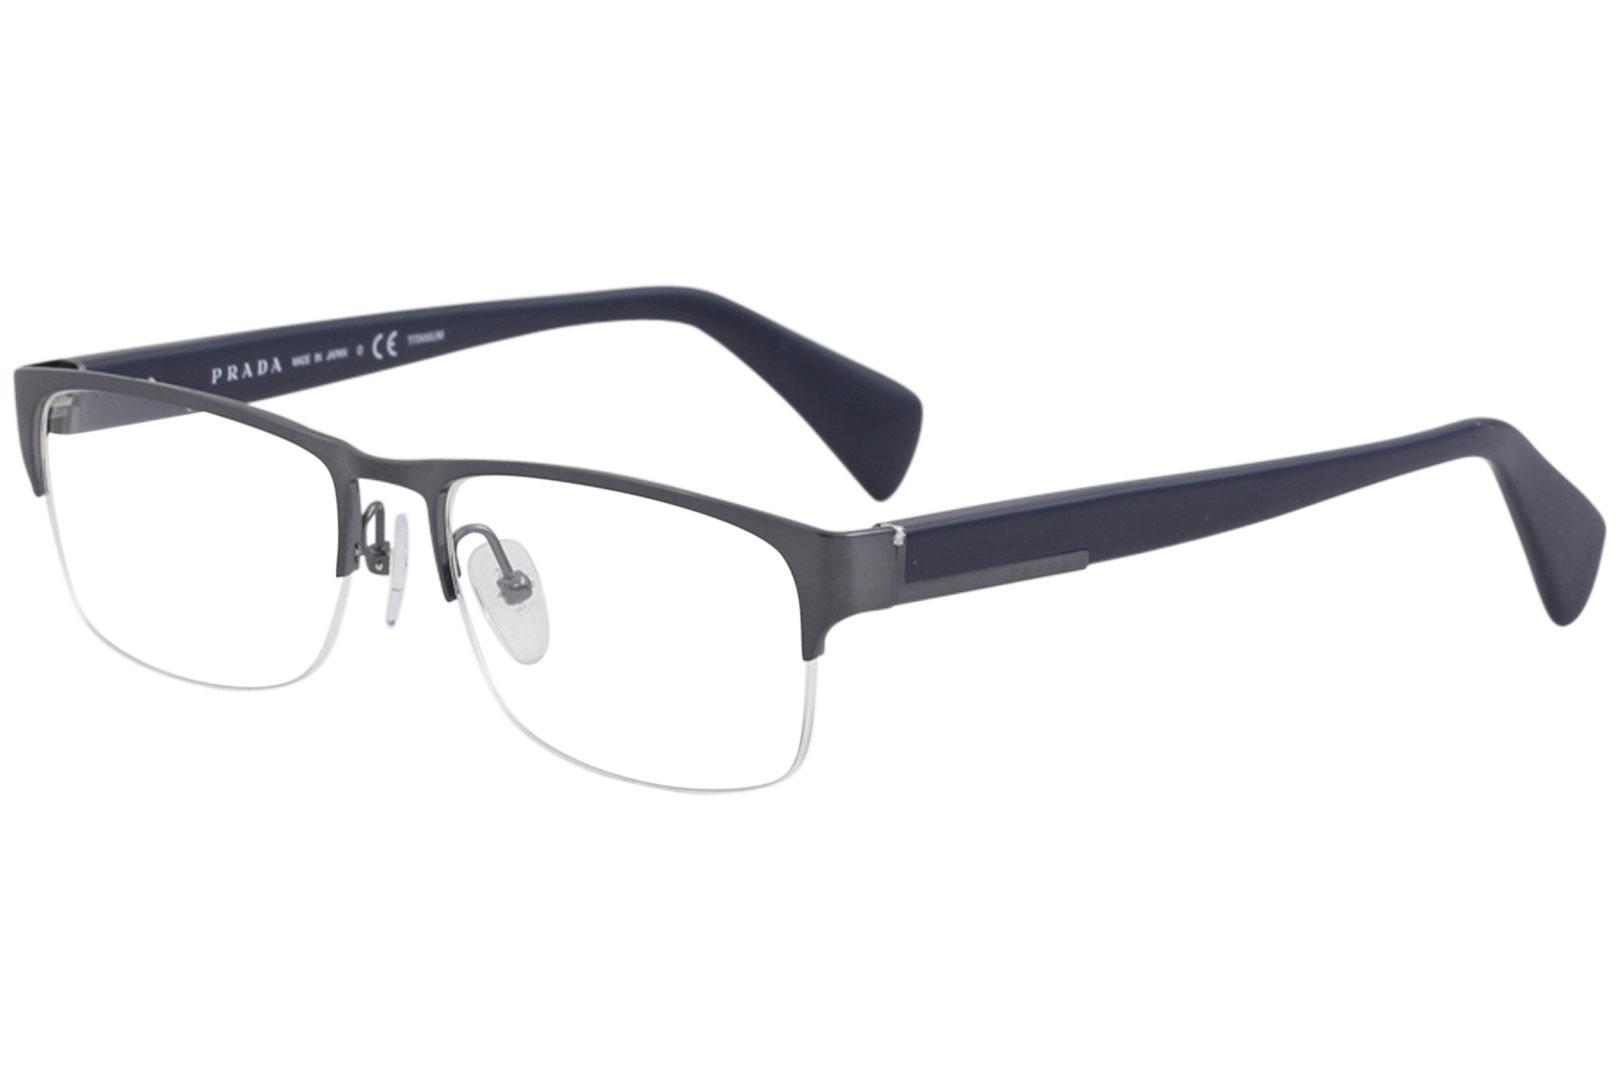 774ecb18976c Prada Men s Eyeglasses VPR52R VPR 52R QFM 1O1 Brushed Blue Optical ...